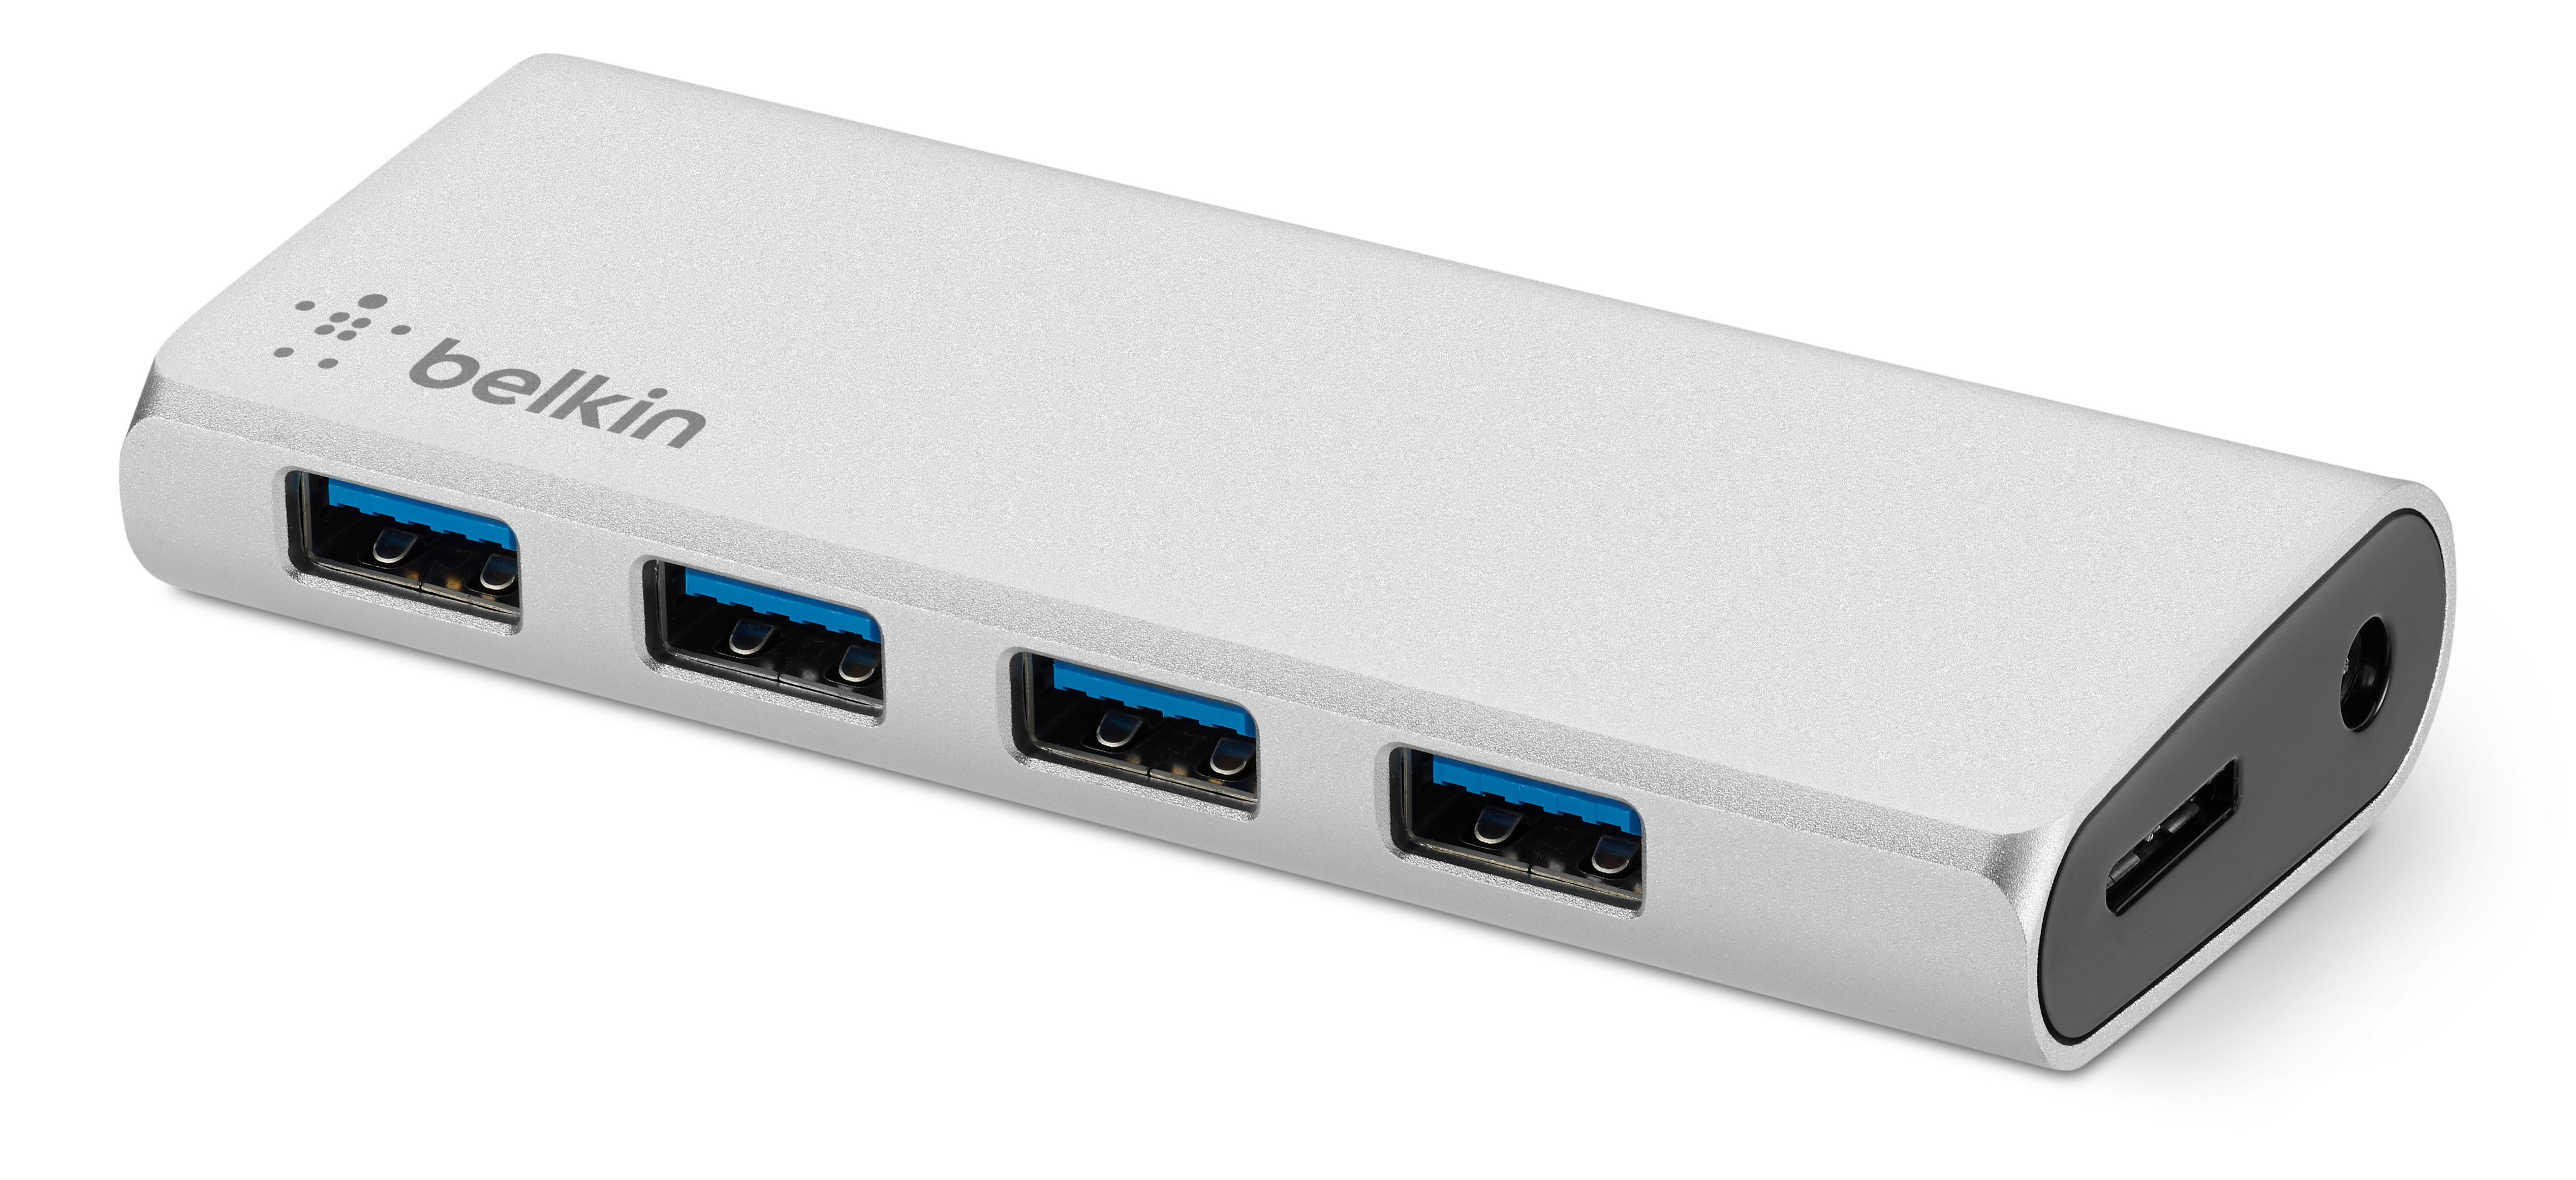 Belkin USB 1.1 1-Port Hub + USB-C Cable